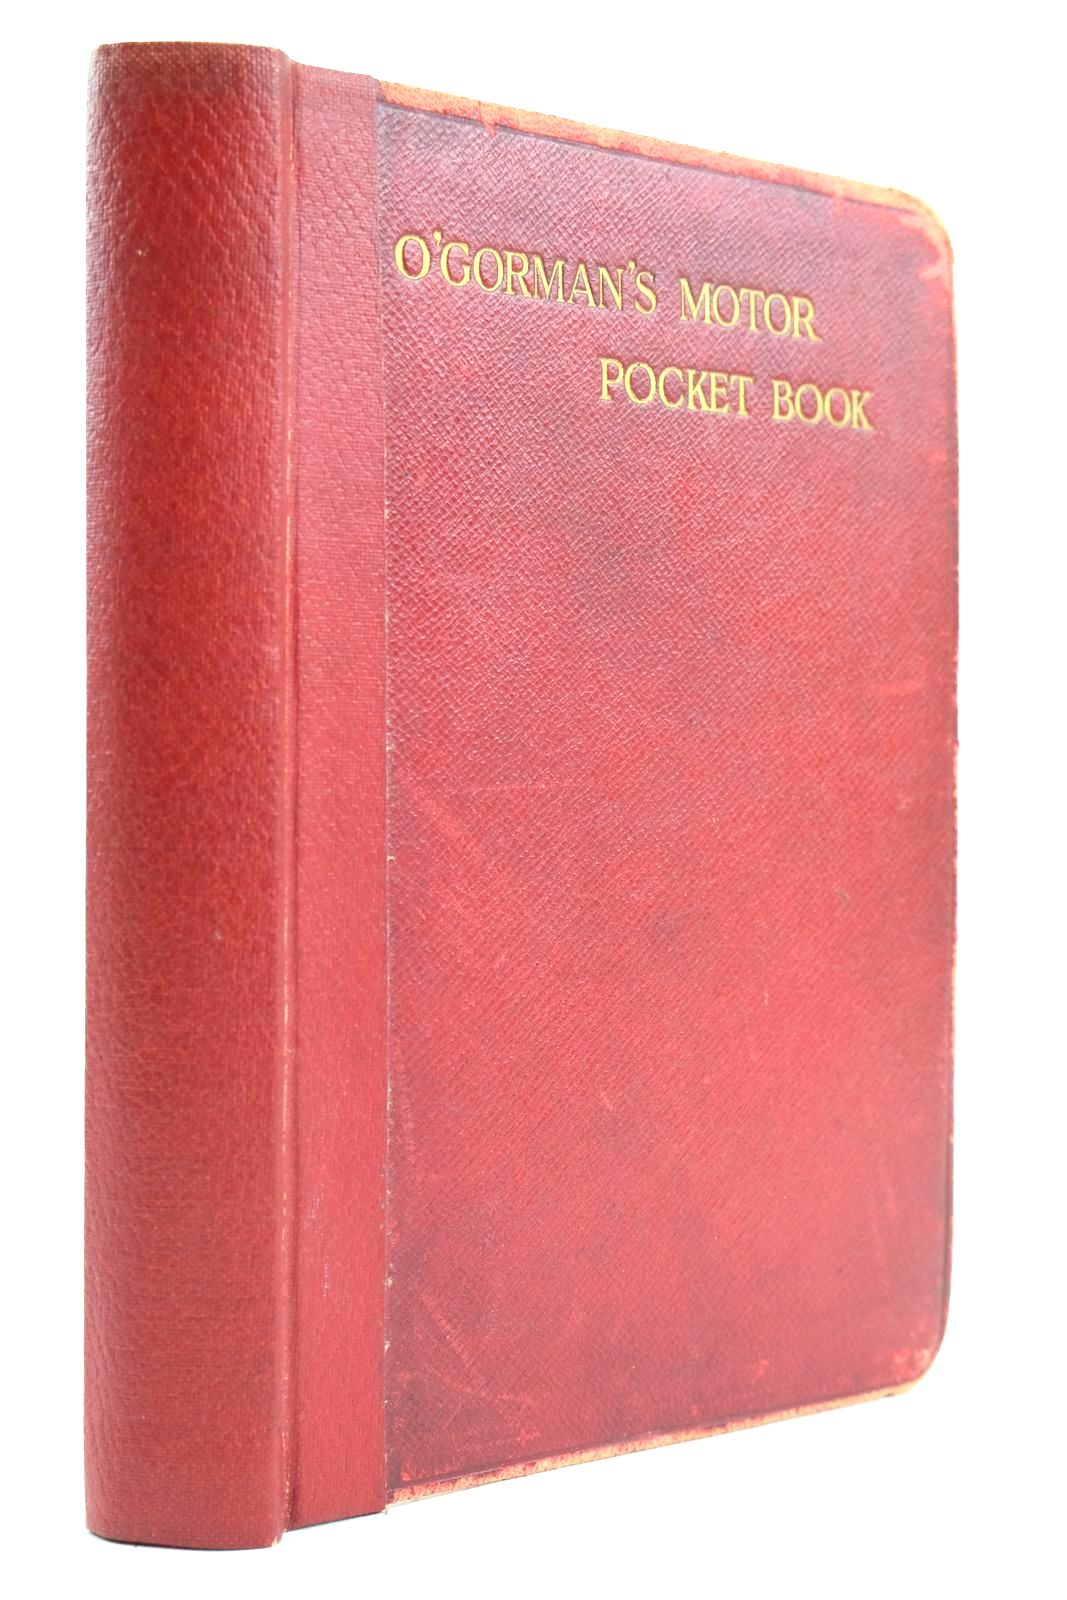 Photo of O'GORMAN'S MOTOR POCKET BOOK- Stock Number: 2132971